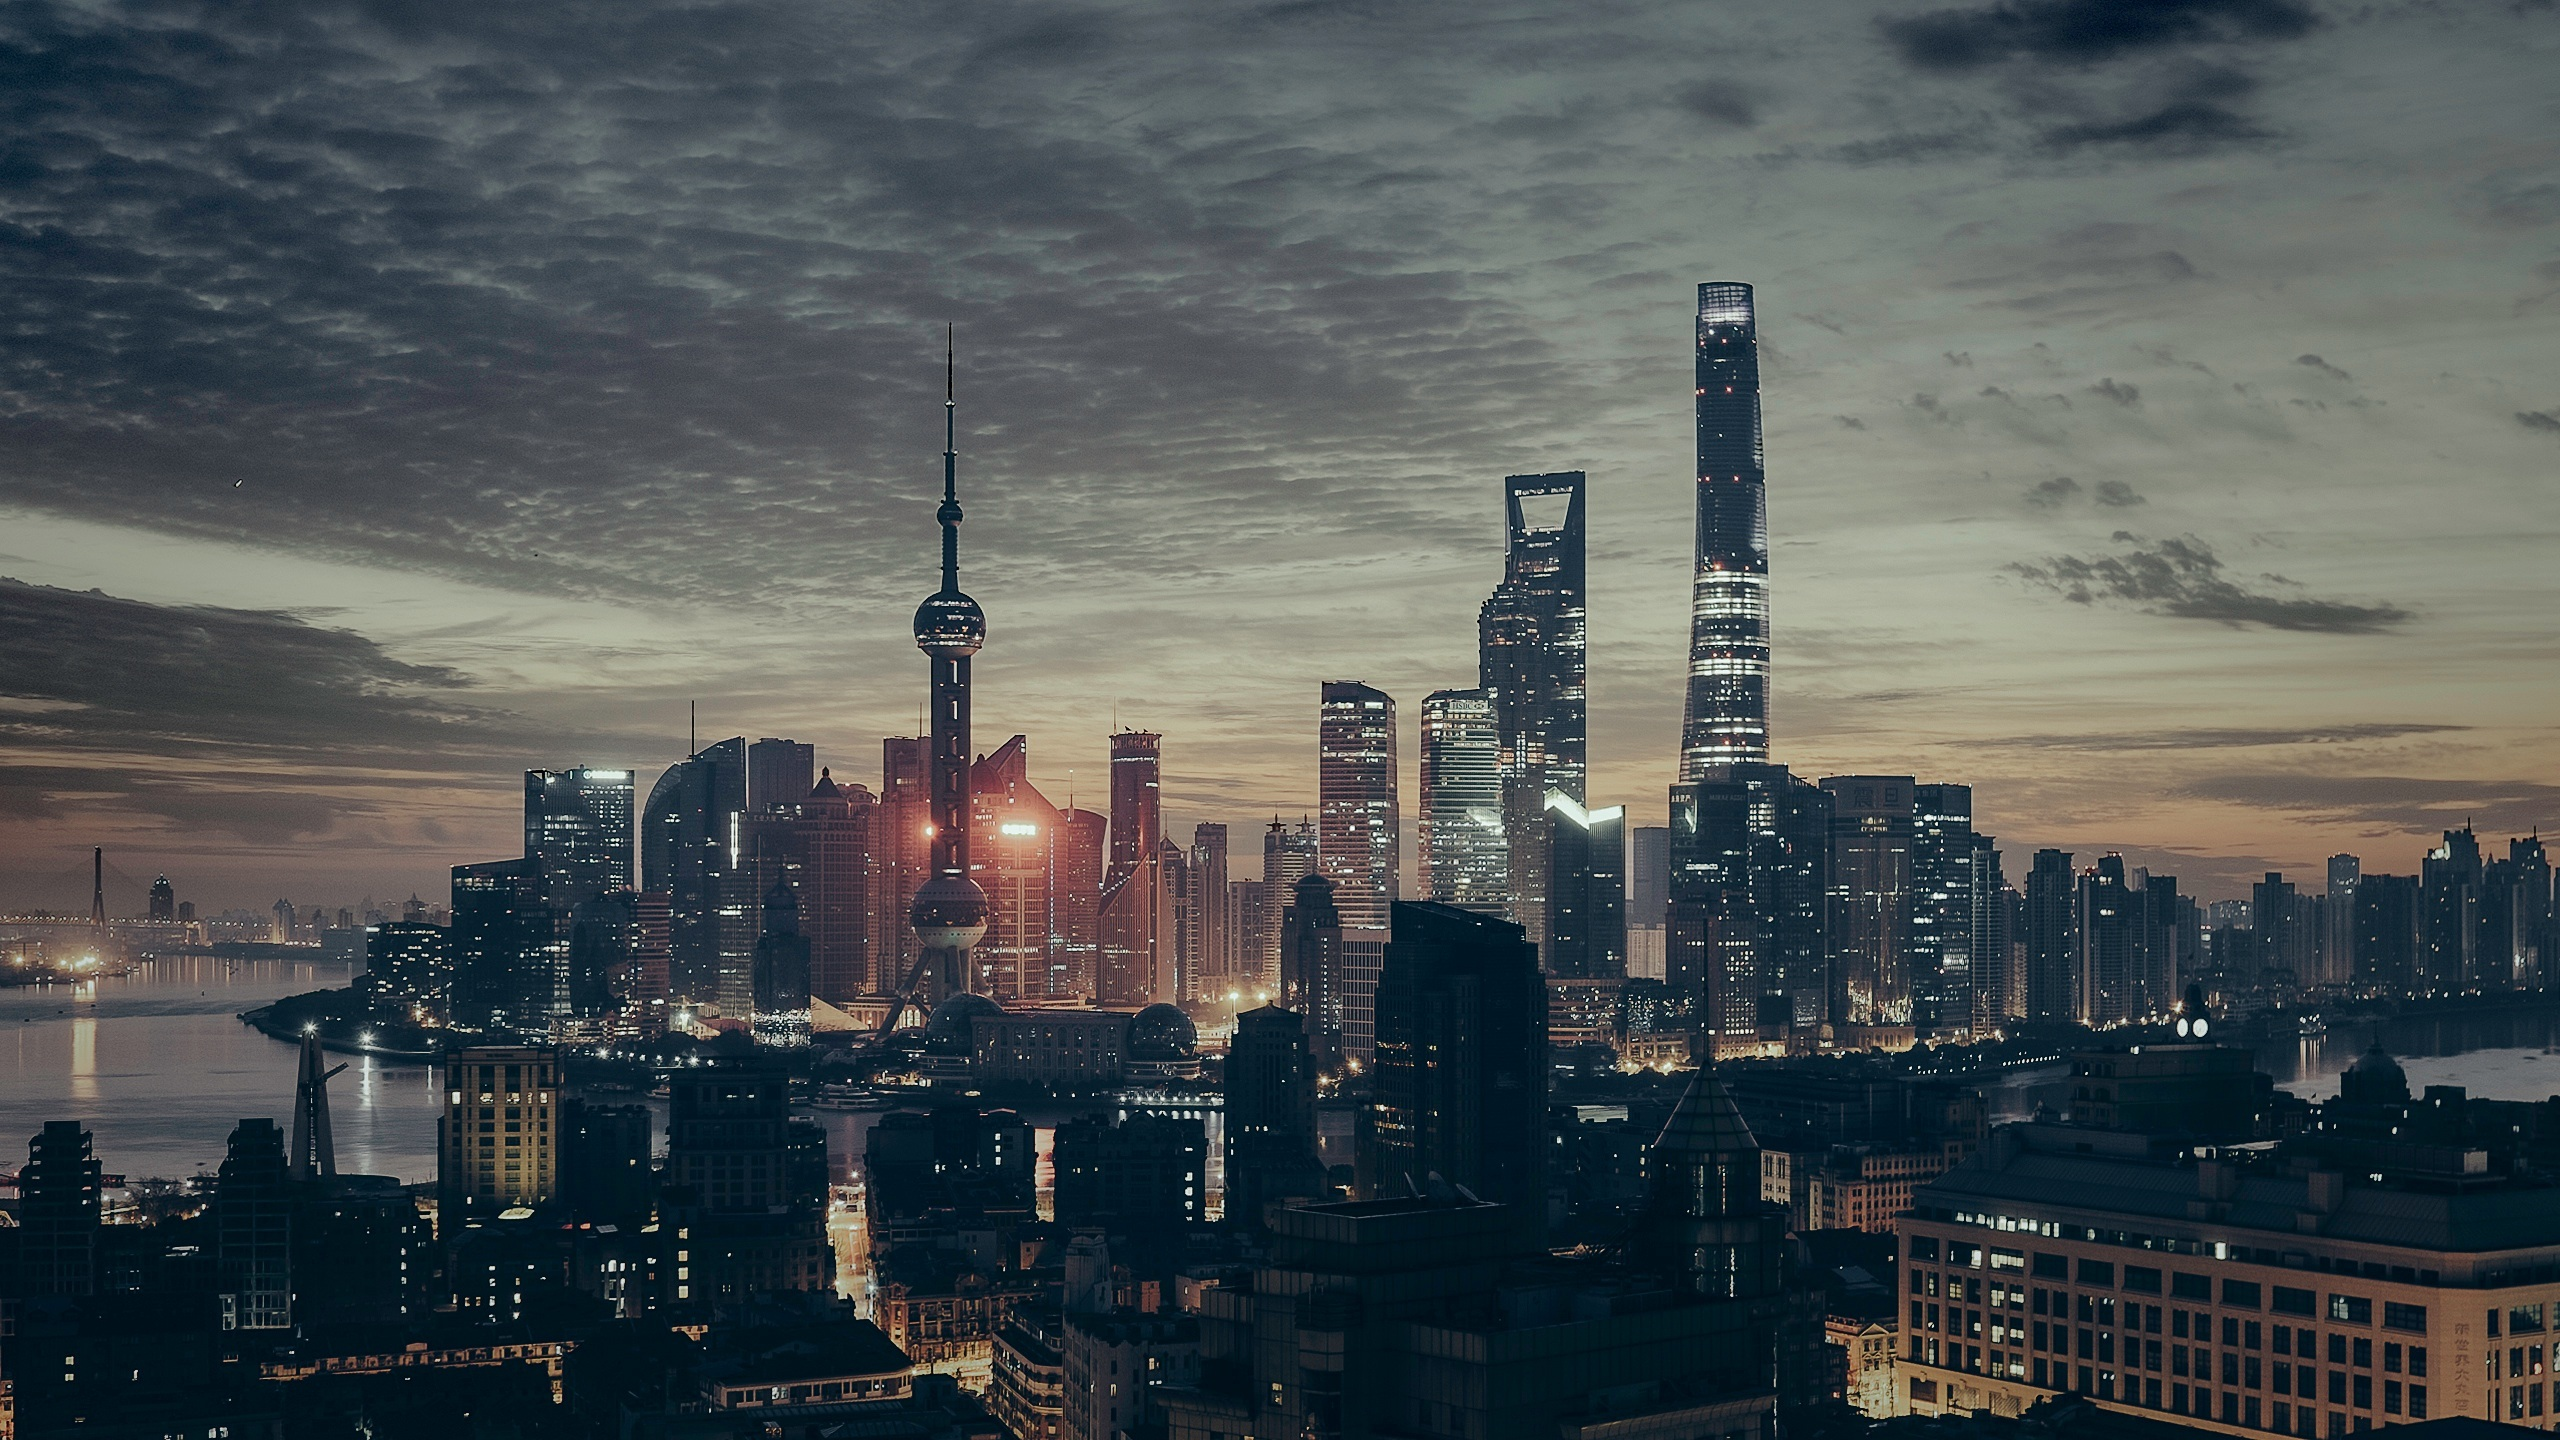 Shanghai, China, at night - Unsplash